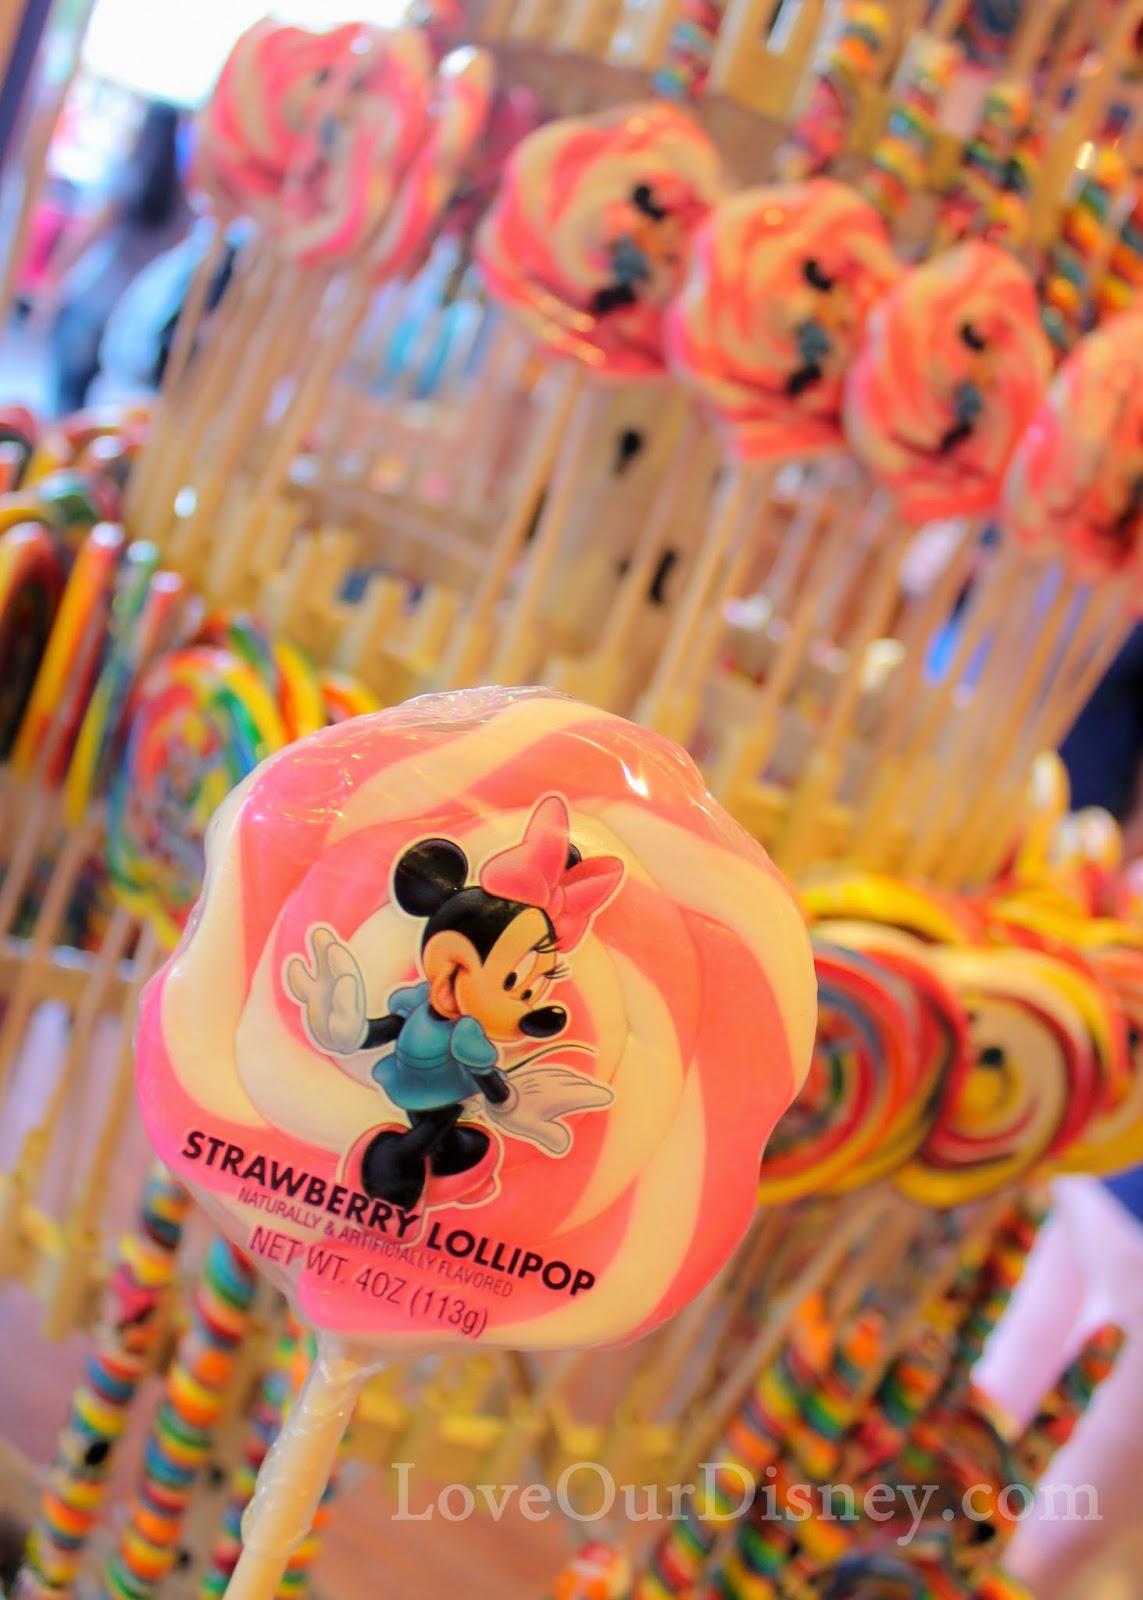 So many sweets at Disneyland's Candy Palace. LoveOurDisney.com